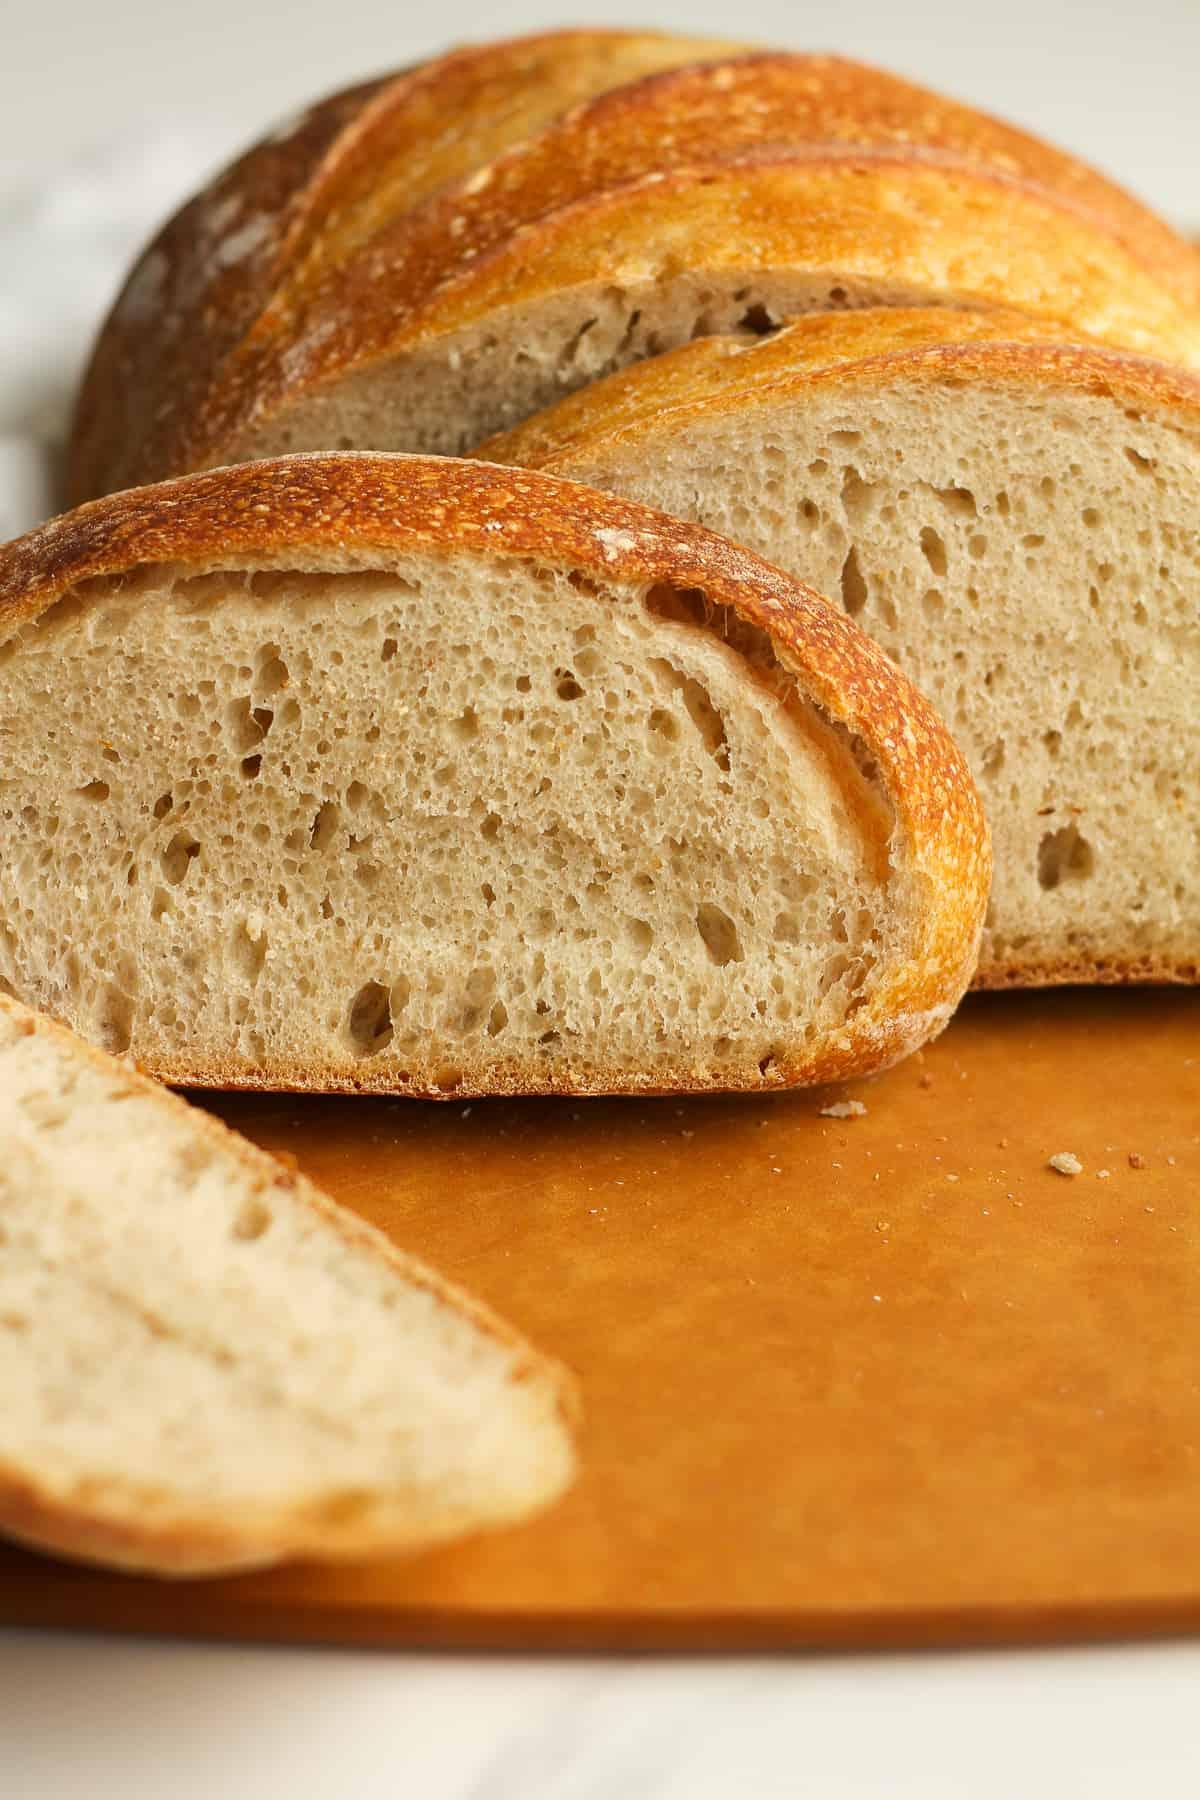 Side closeup shot of sliced bread.